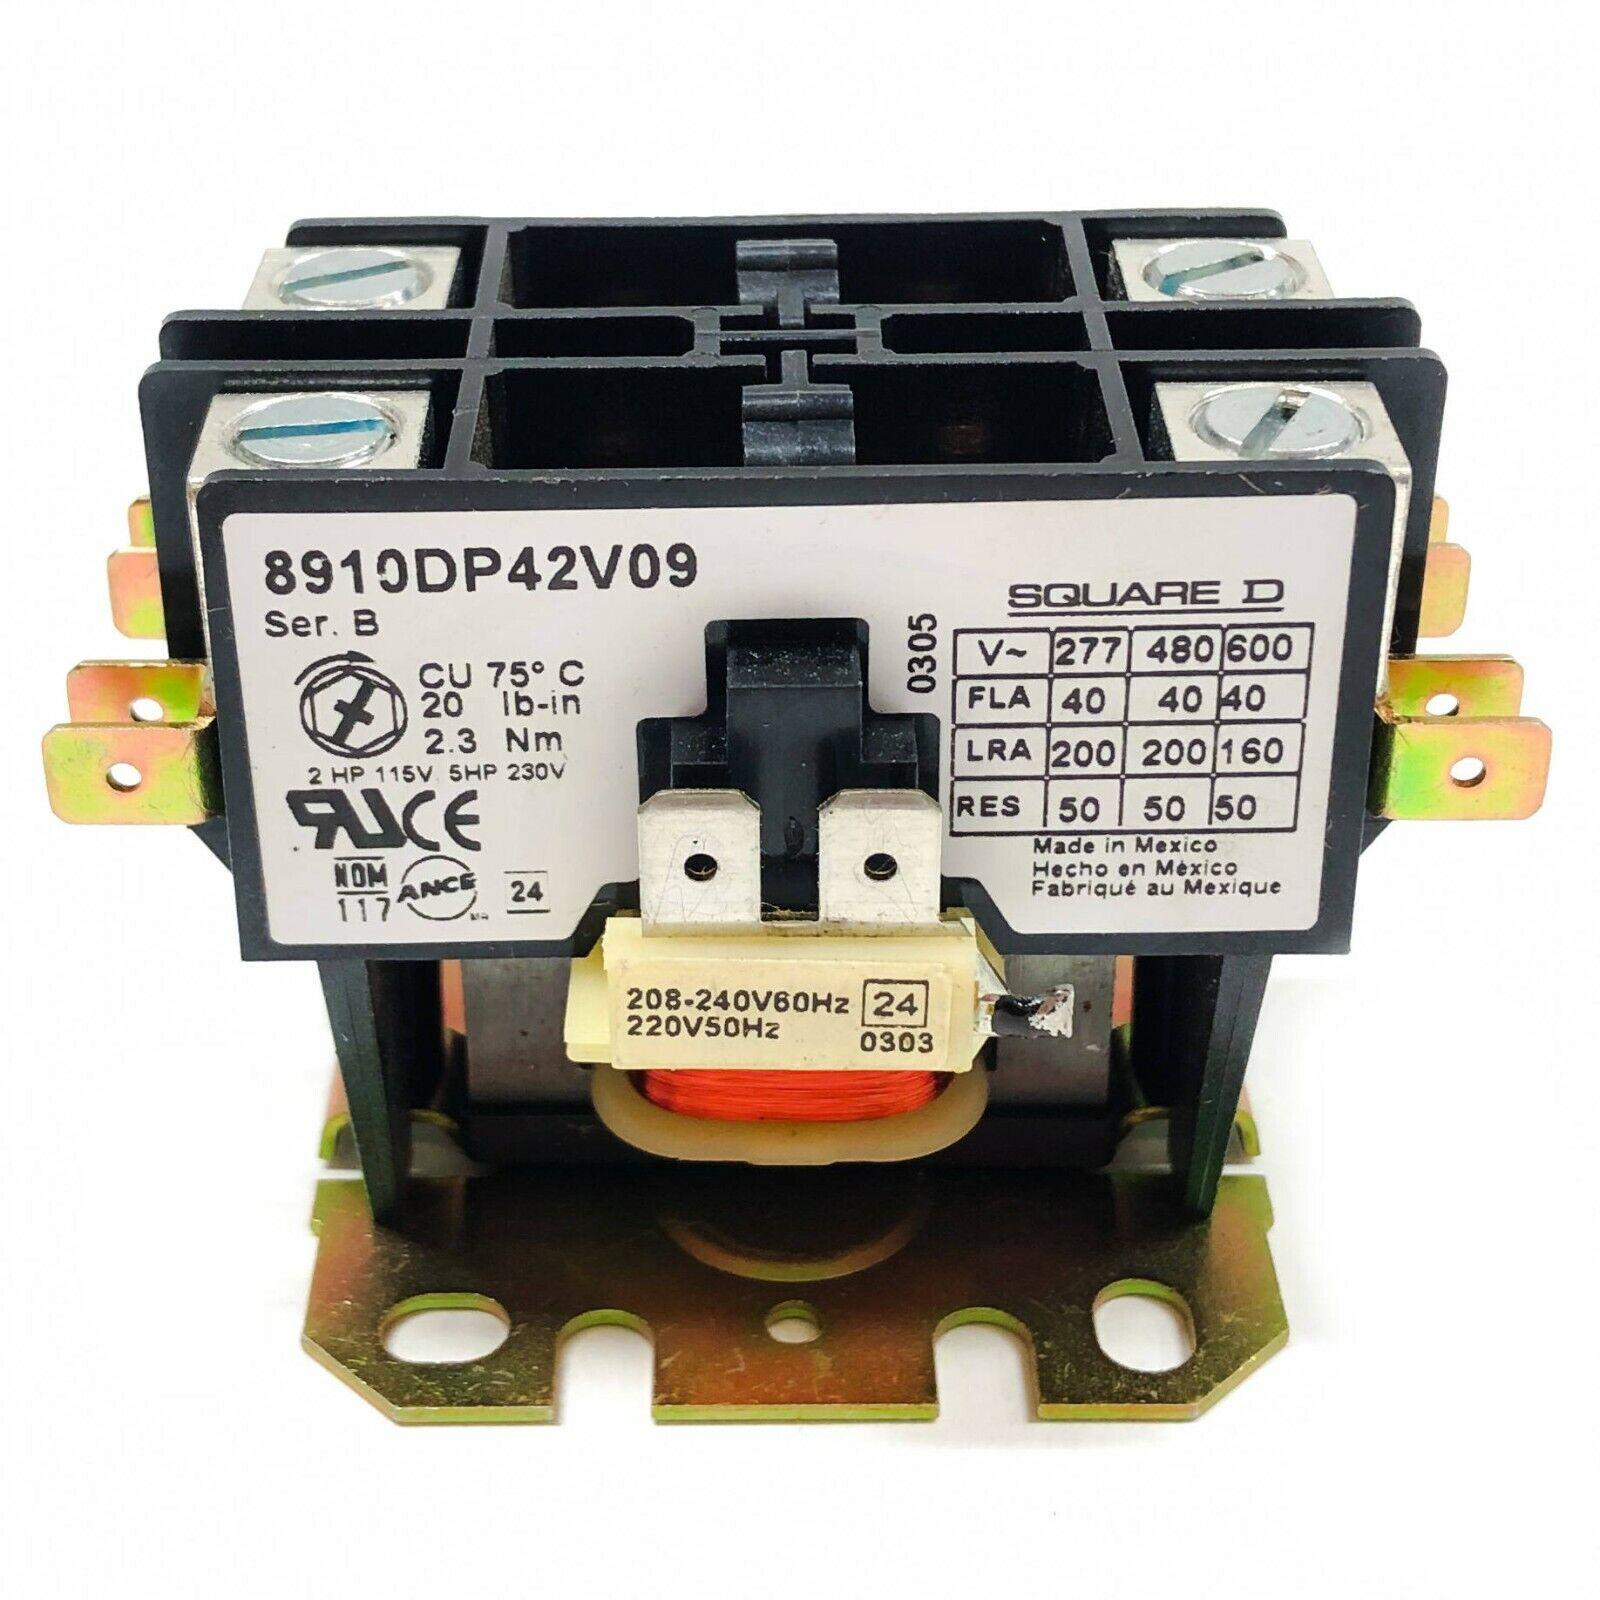 8910dp42v09 Square D Contactor 40fla 50 a Res 208-240v 60hz Coil 2 Pole for sale online